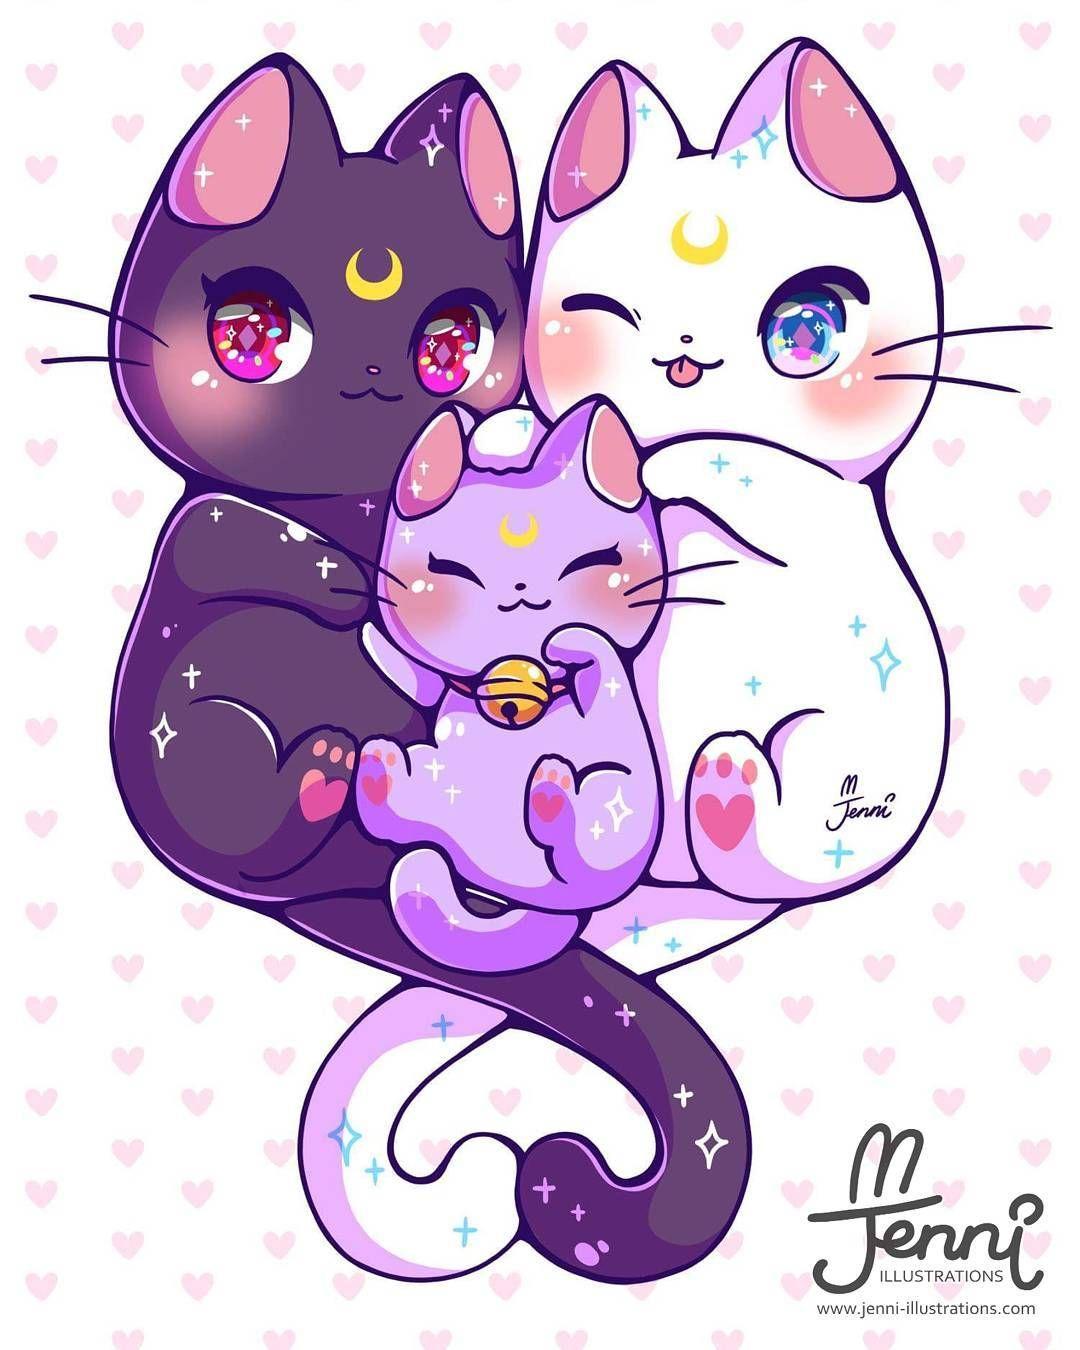 Luna Artemis Diana Sailormoon Luna Artemis Chibi Jenniilustrations Jennilustrat Sailor Moon Cat Sailor Moon Art Cute Kawaii Drawings